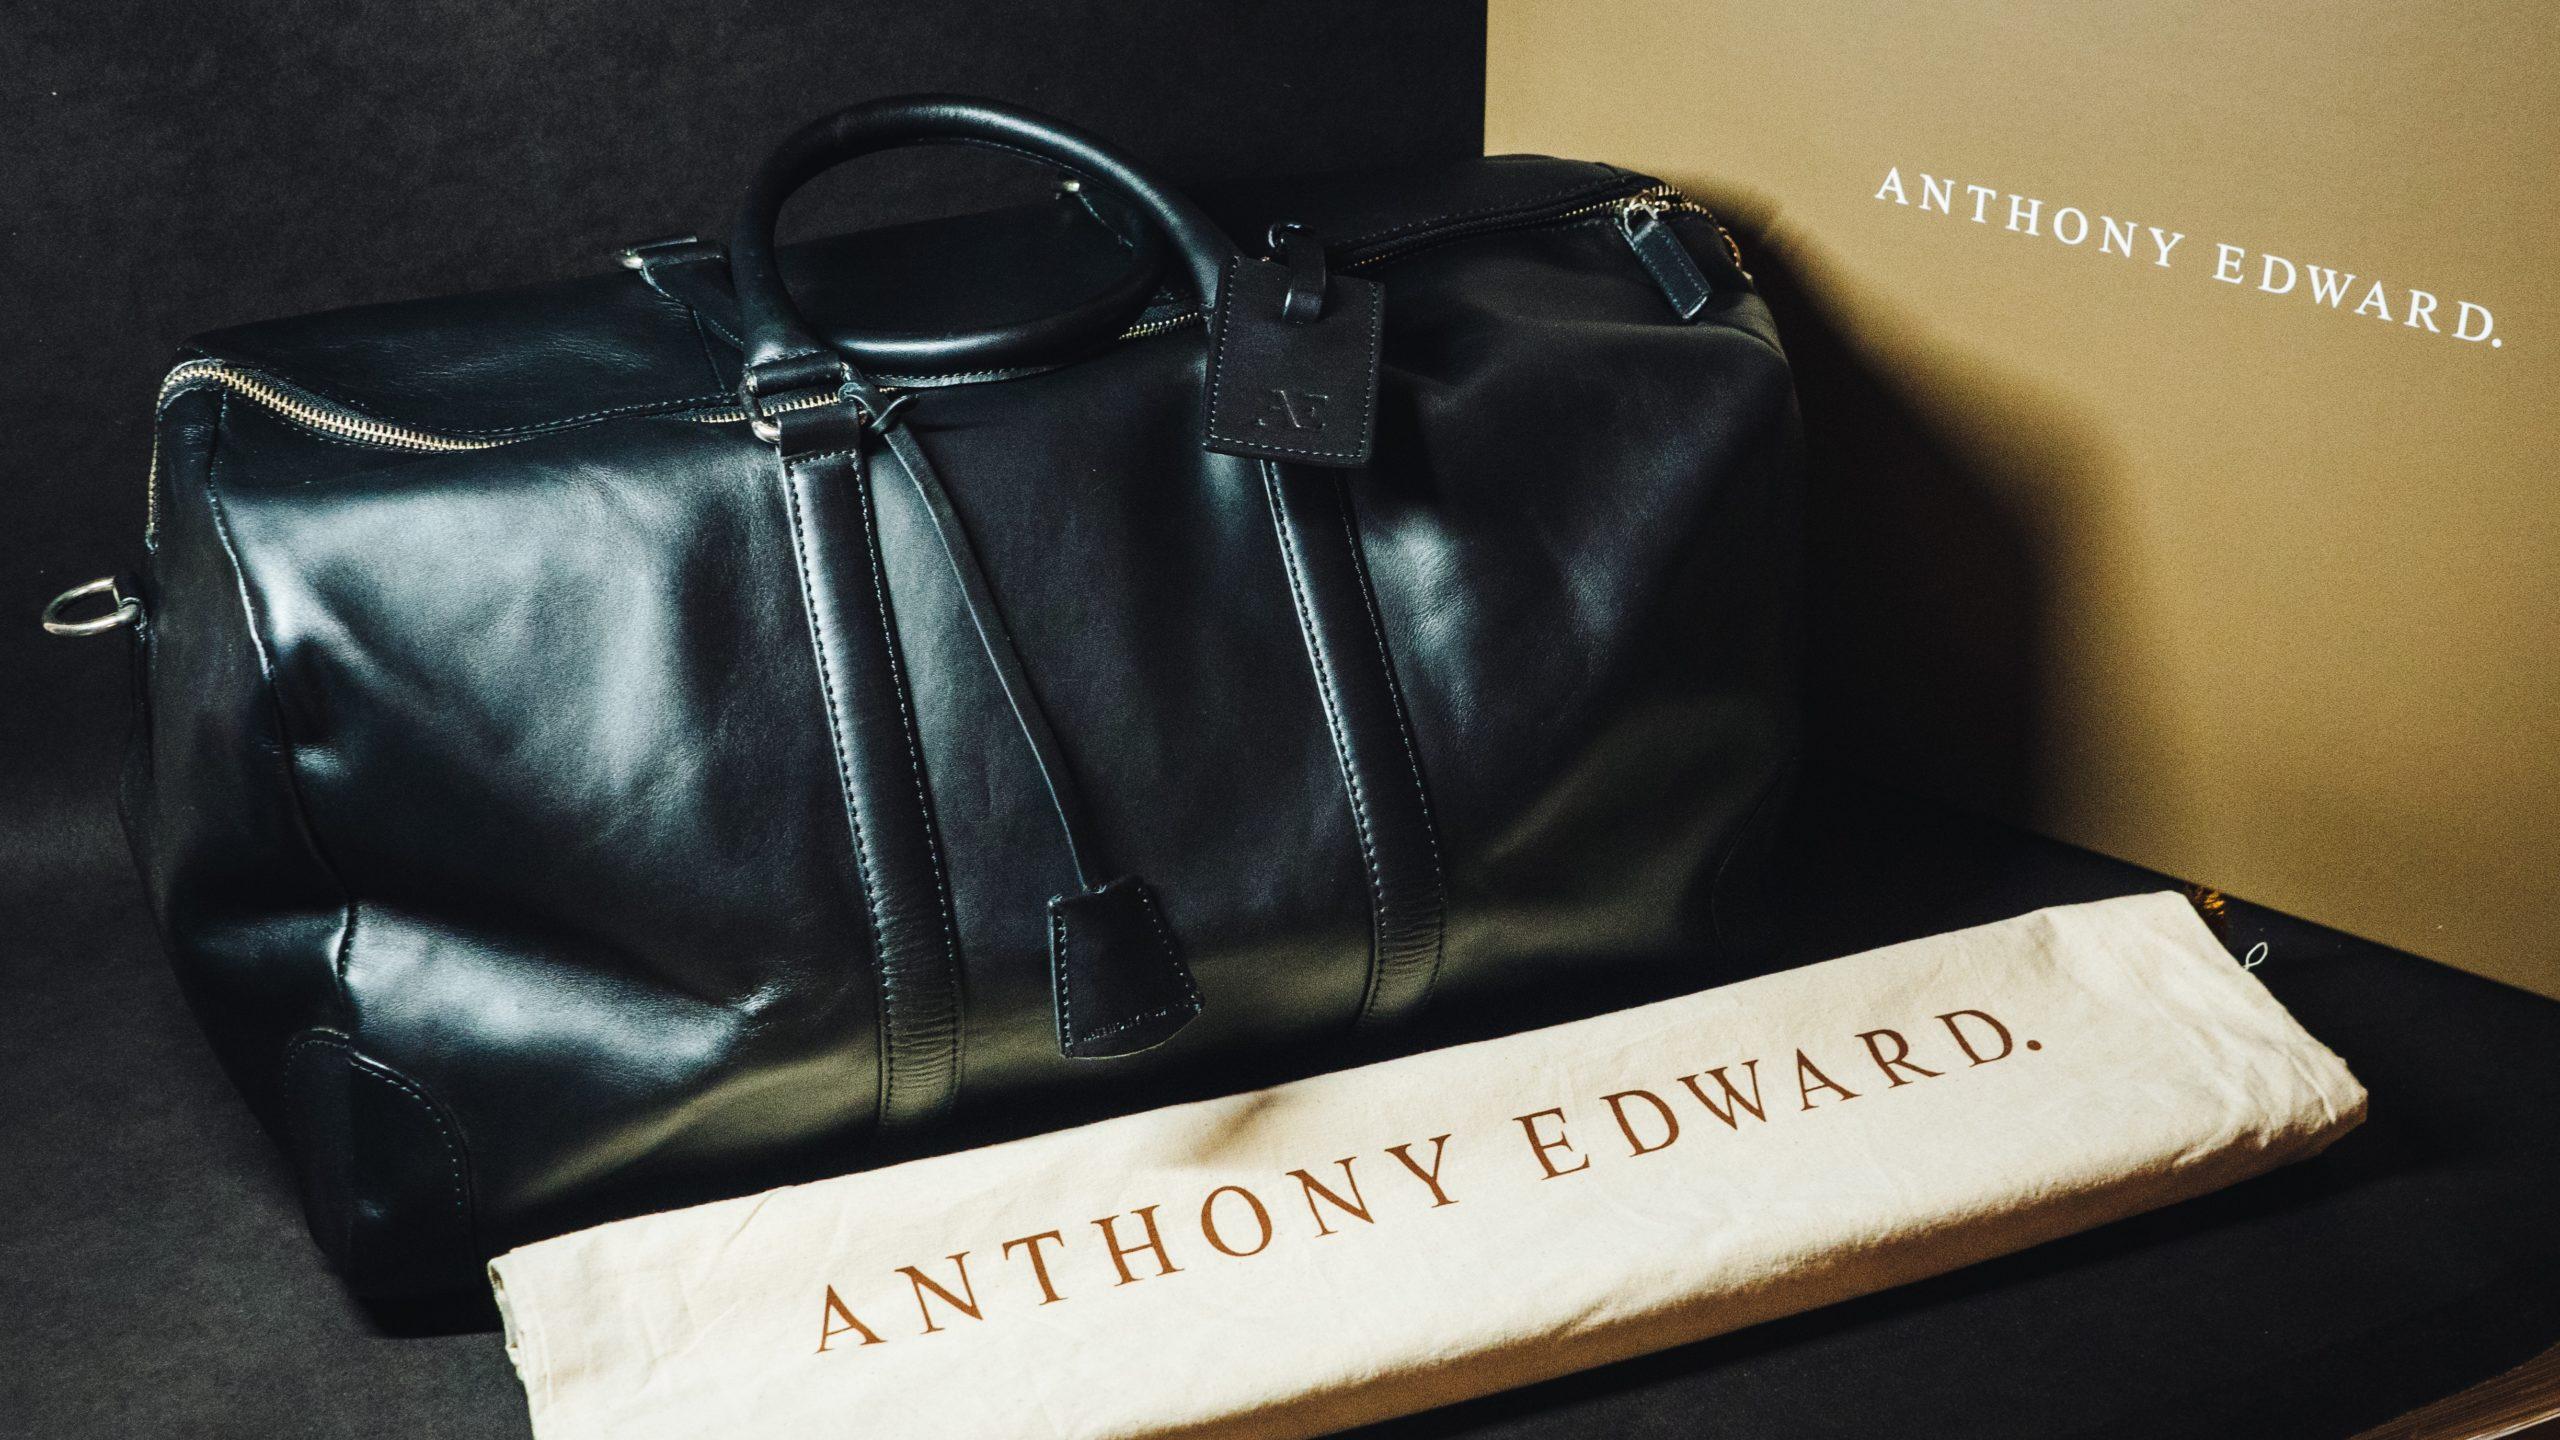 ANTHONY EDWARD ダッフルバッグが旅のカバンに仲間入り